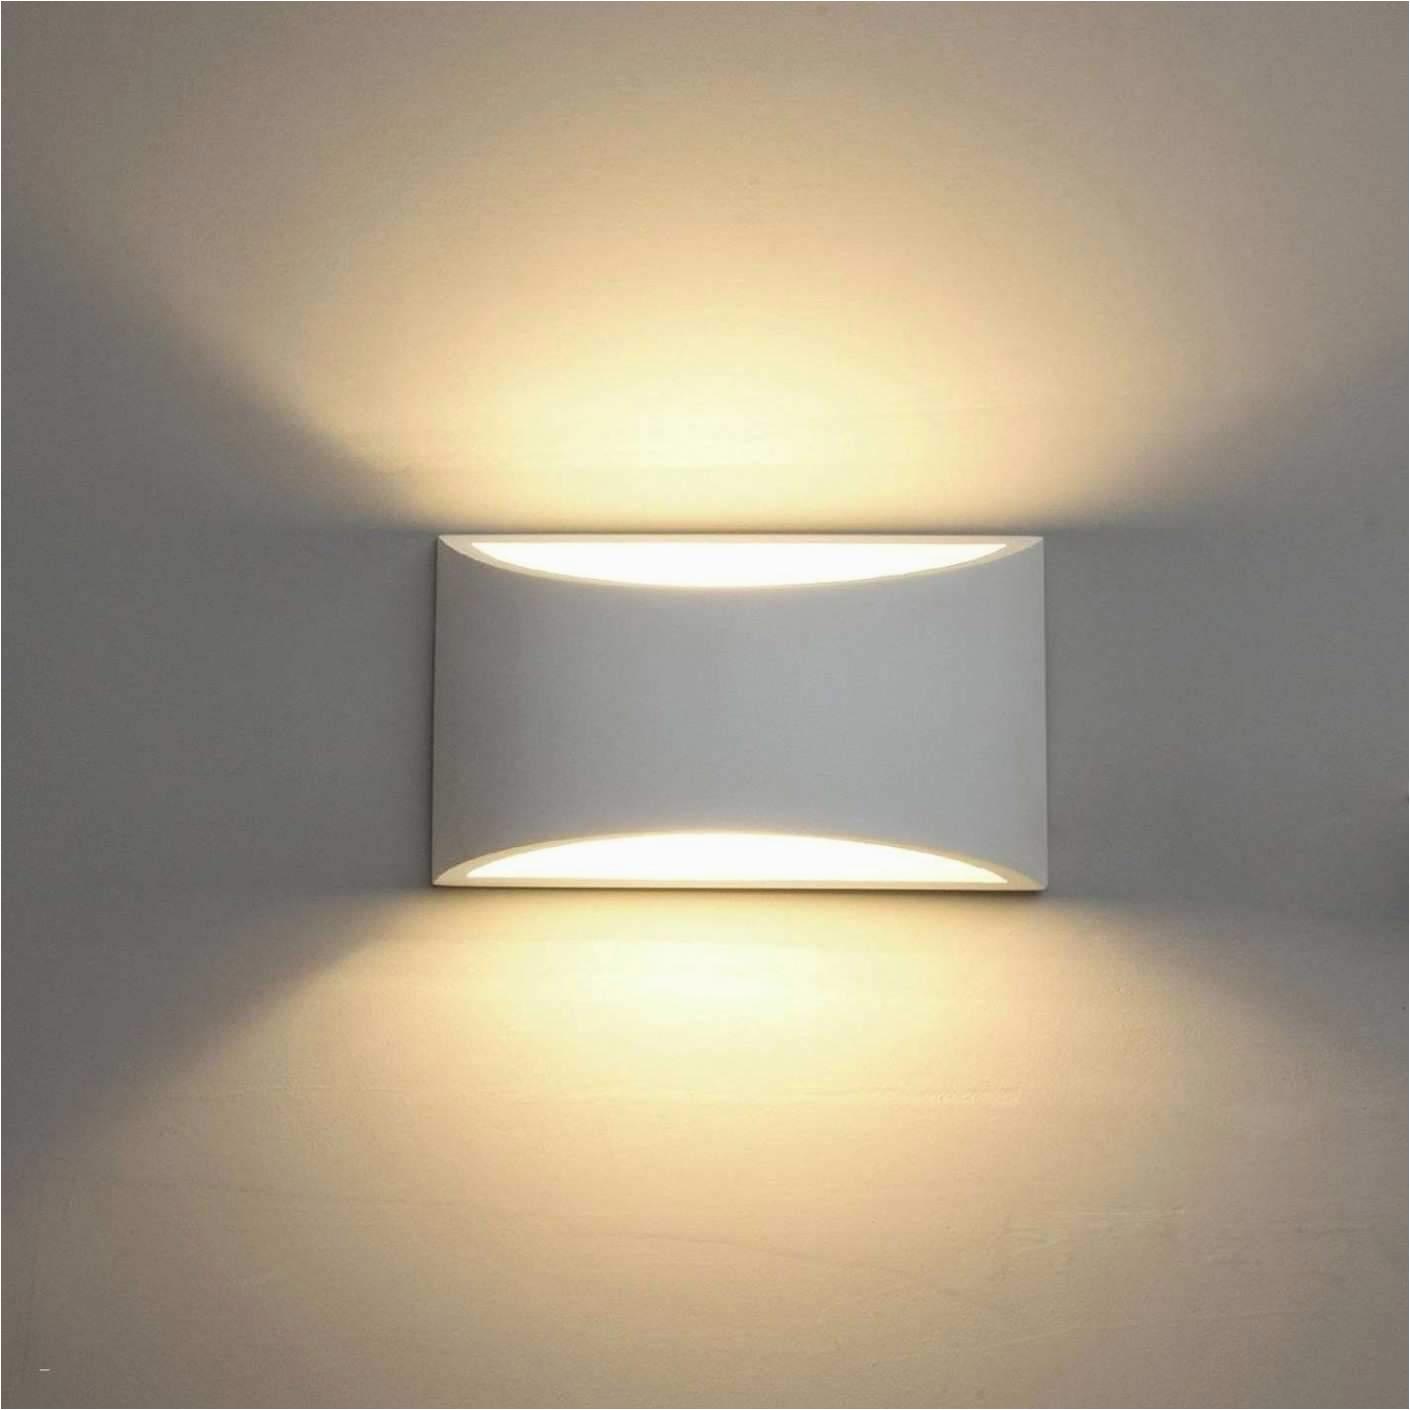 Badezimmer Lampe Led 26 Reizend Led Lampen Wohnzimmer Inspirierend